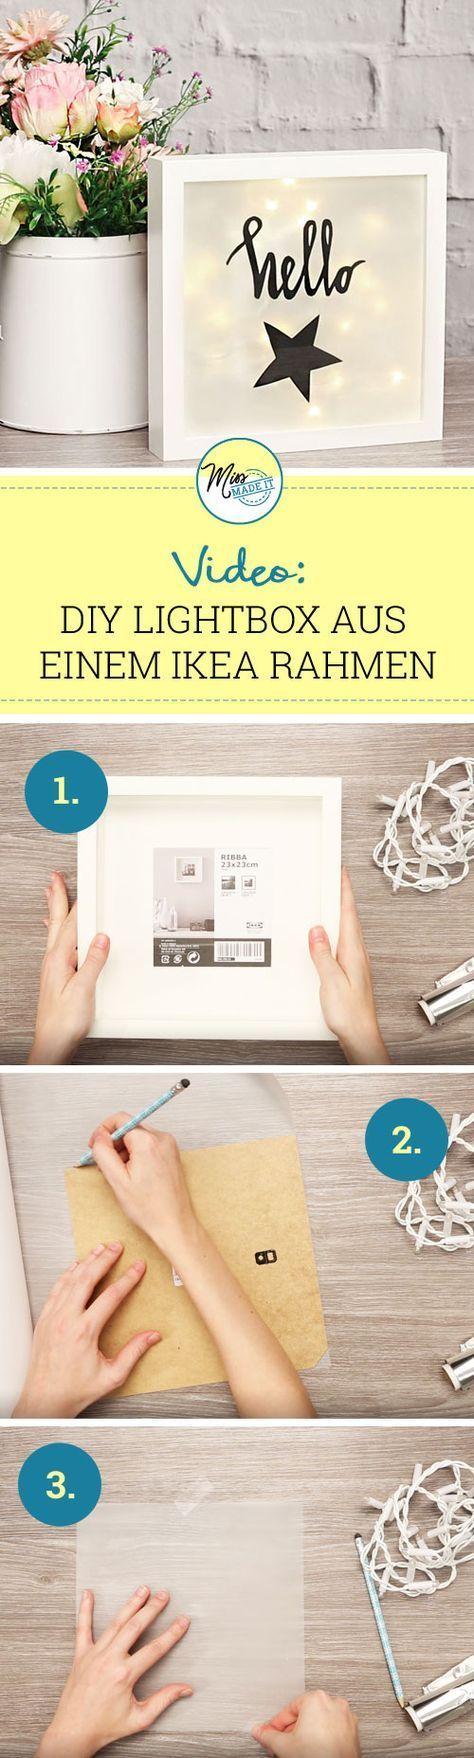 Ikea Bilderrahmen: Vom Ikea Ribba Rahmen zur angesagten Light Box